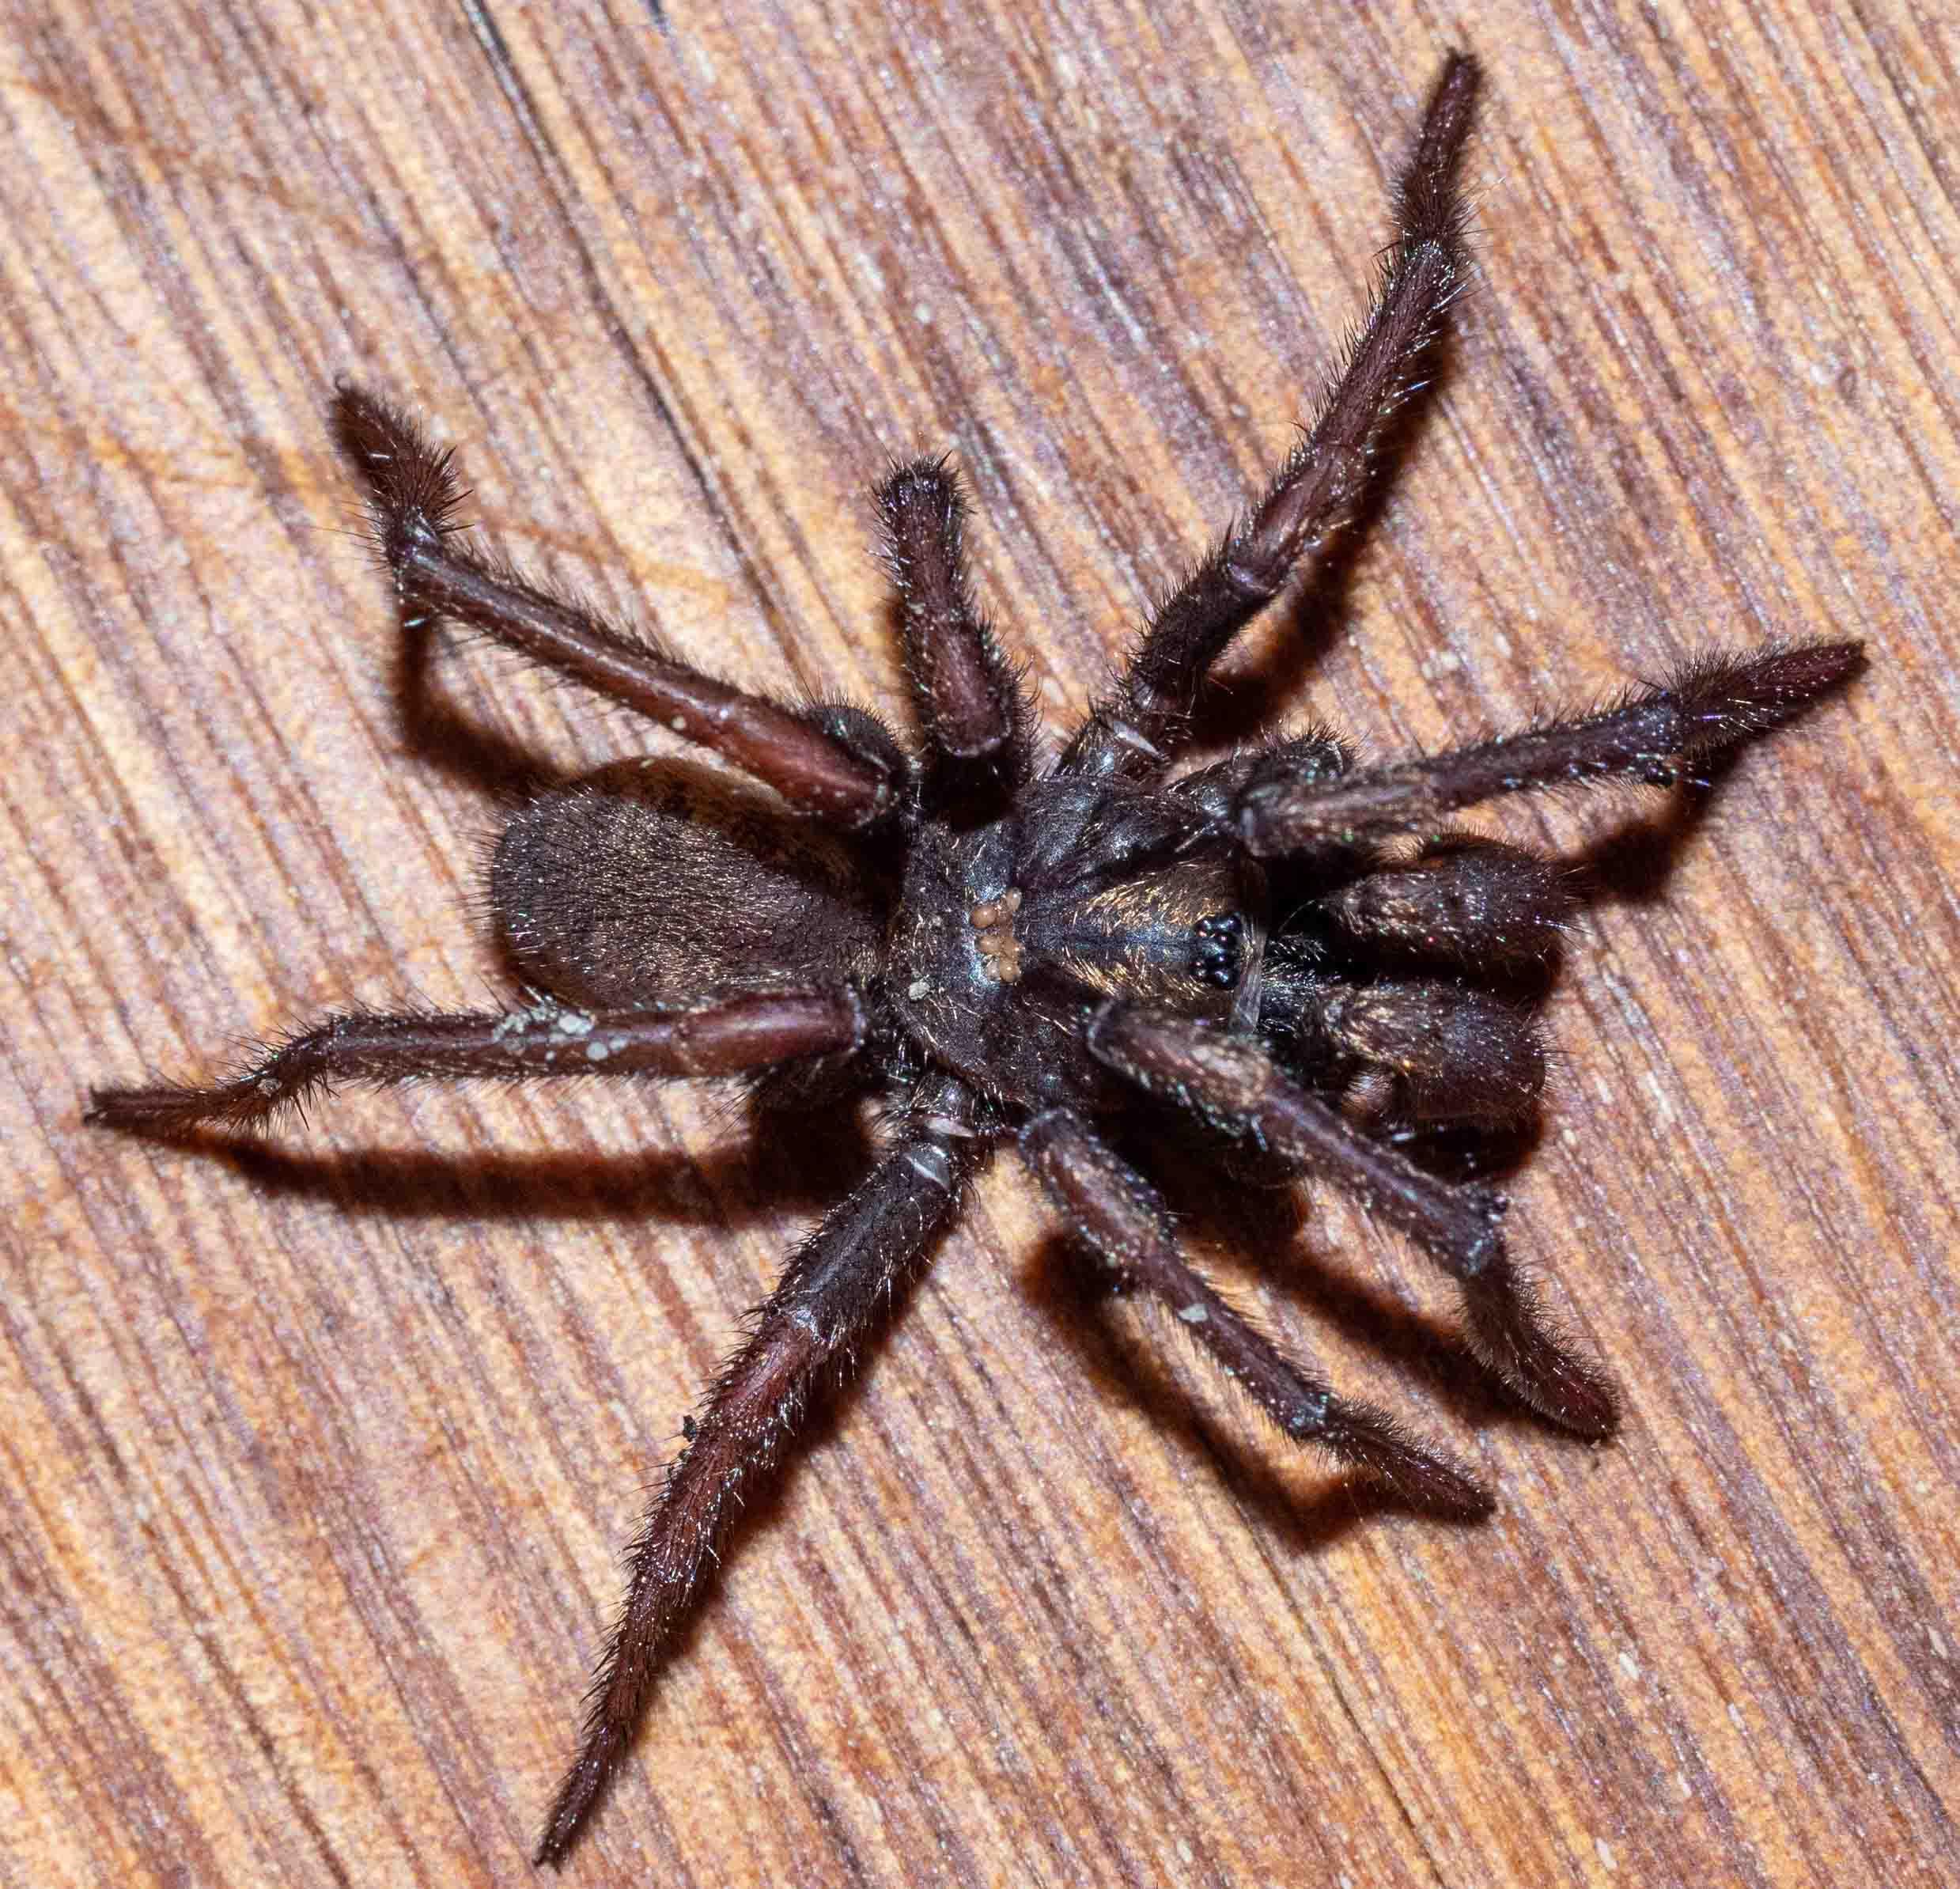 Spiny Trapdoor Spider